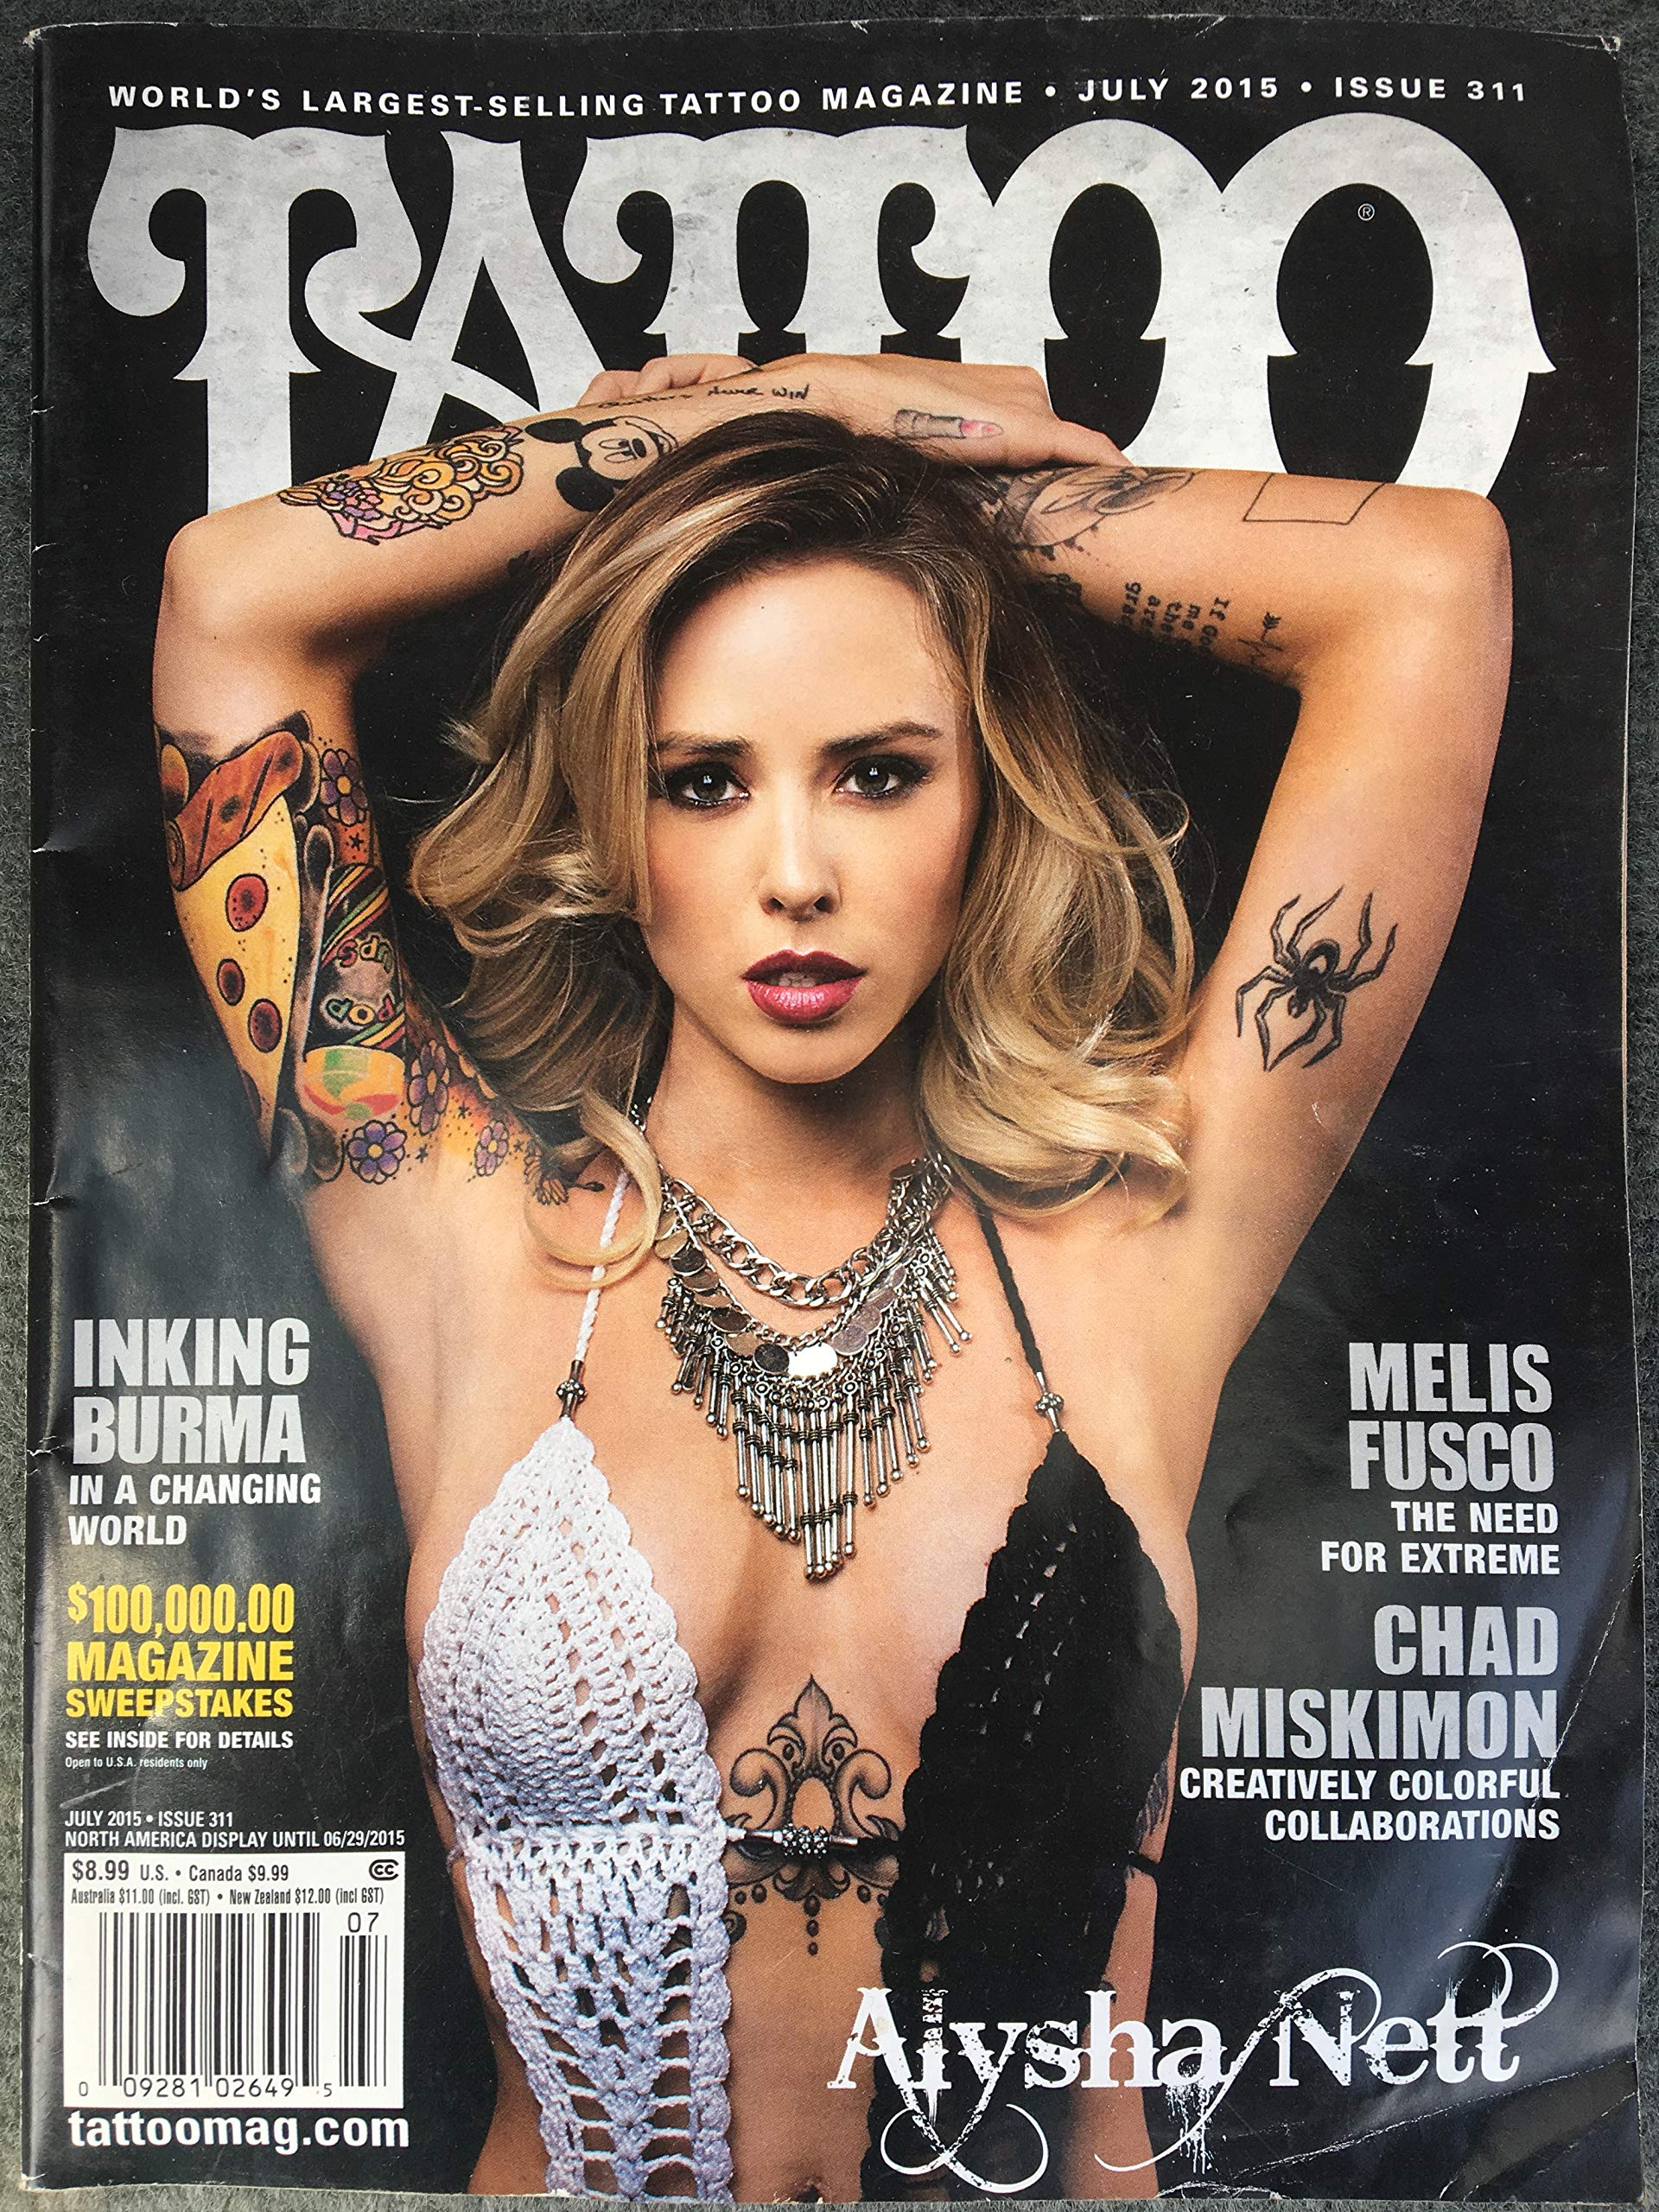 Amazon.com: Tattoo Magazine July 2015 #311 - Two Magazines in One ...